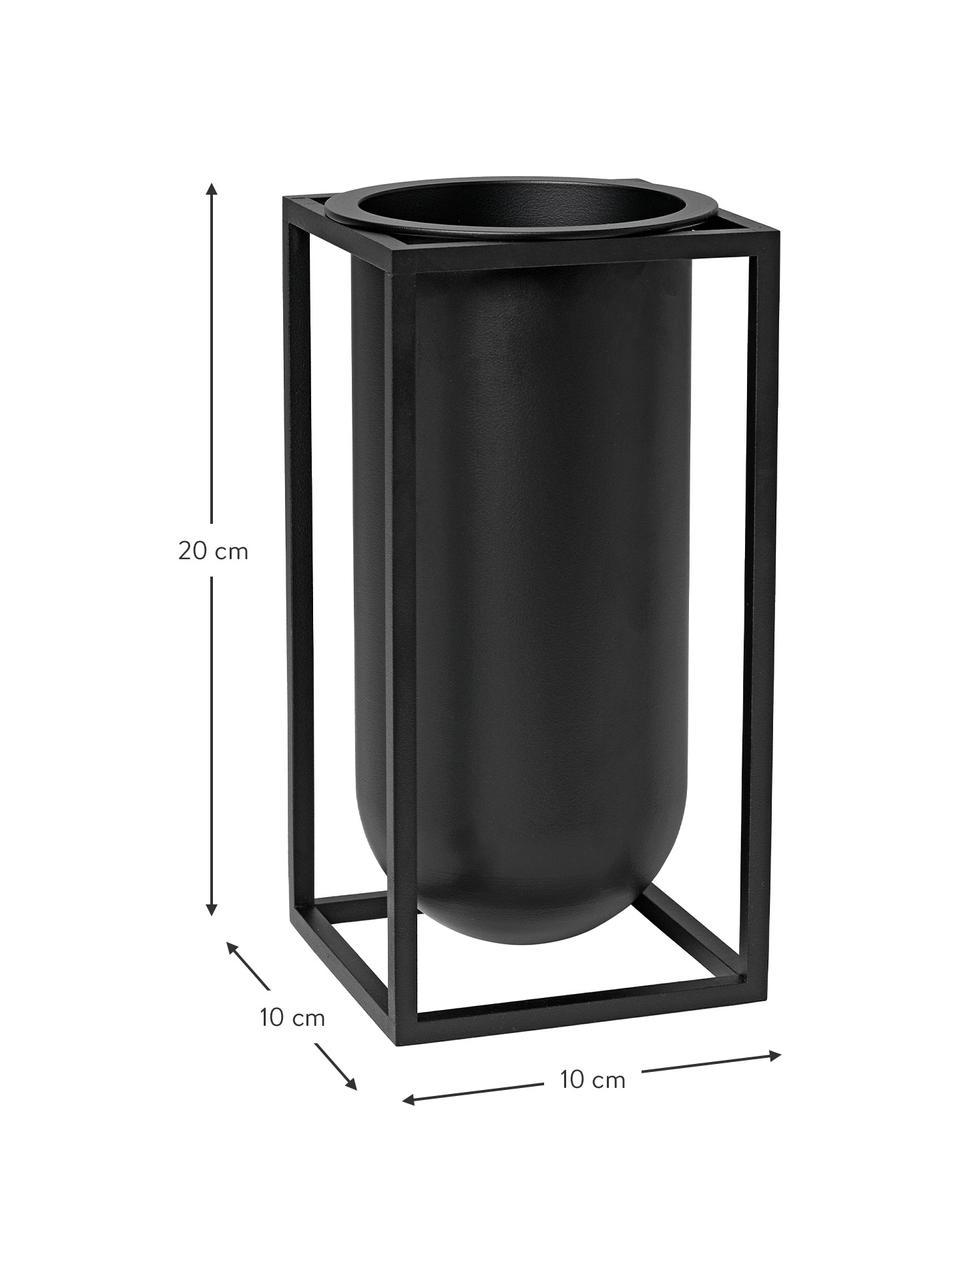 Handgefertigte Vase Kubus aus Aluminium, Aluminium, lackiert, Schwarz, 10 x 20 cm